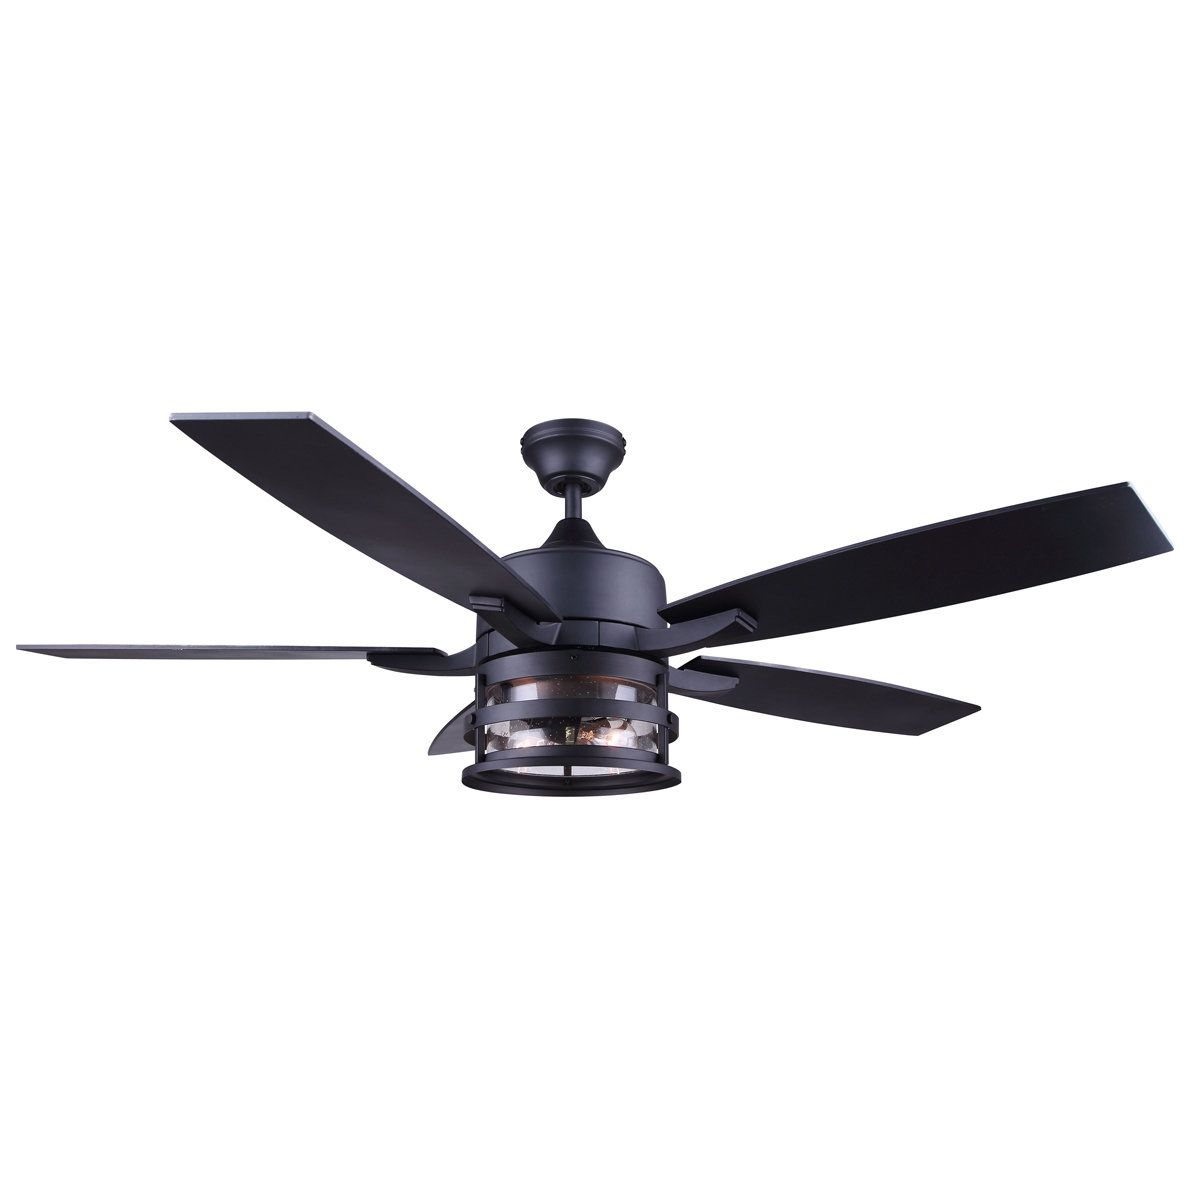 52 Vintage Cylinder Seeded Ceiling Fan Rustic Ceiling Fan Black Ceiling Fan Ceiling Fan With Light